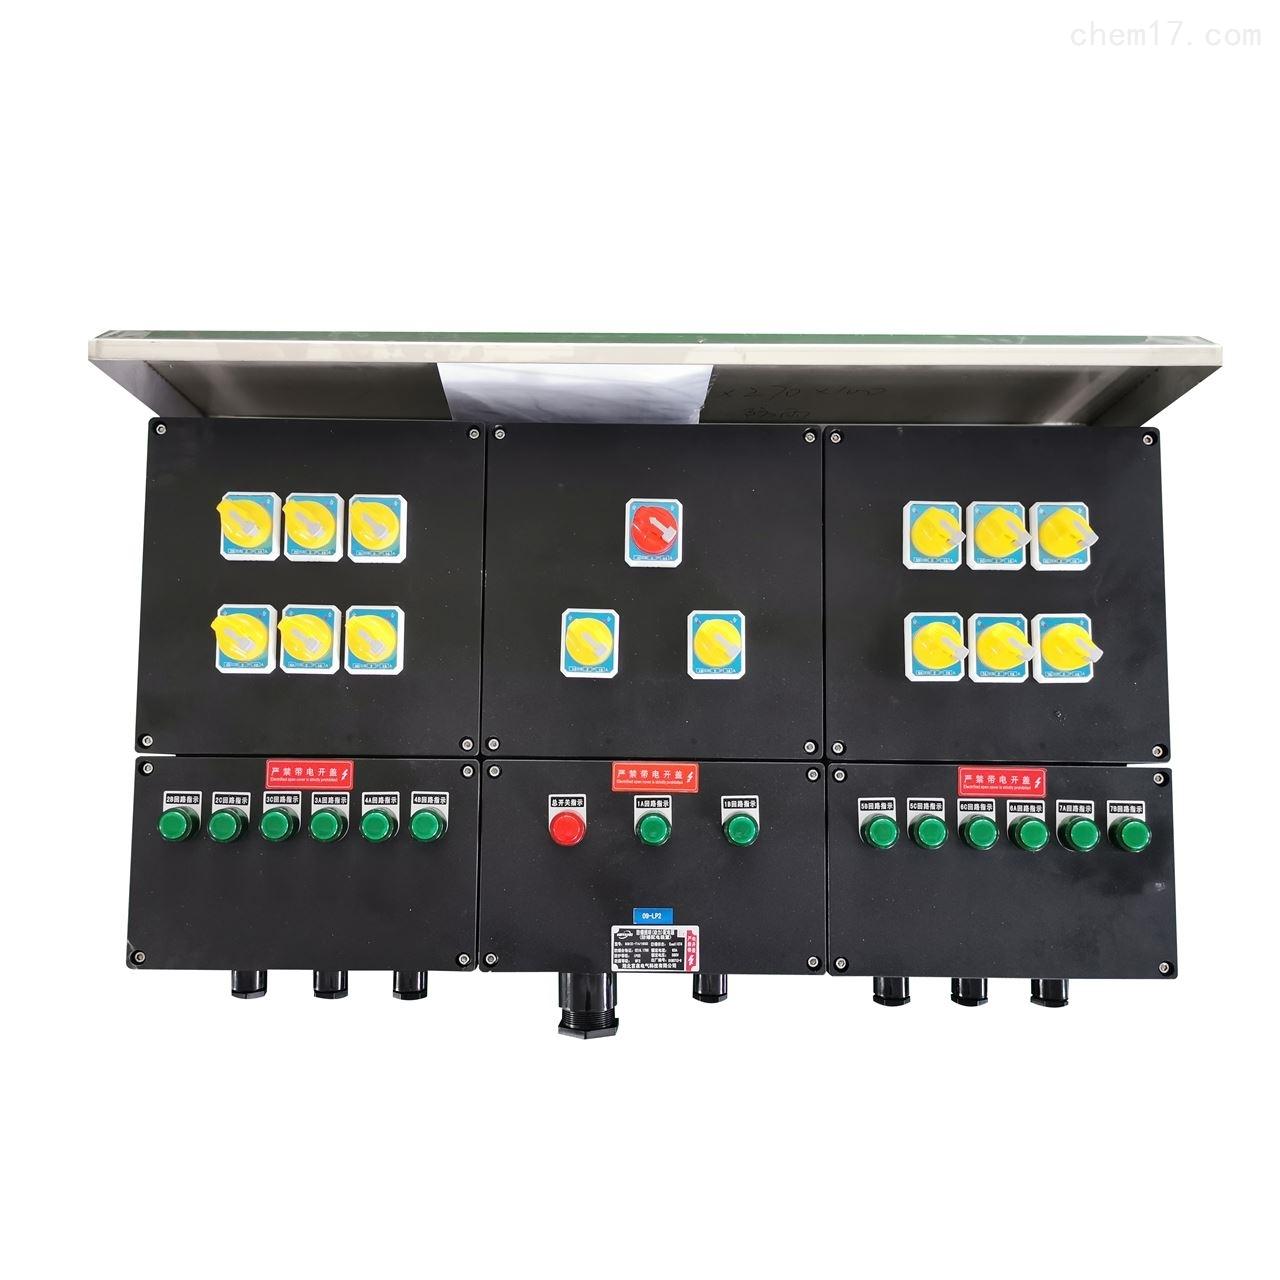 BXM51-4/32K100防爆照明配电箱厂家 BXM51-4/32K100防爆照明配电箱报价